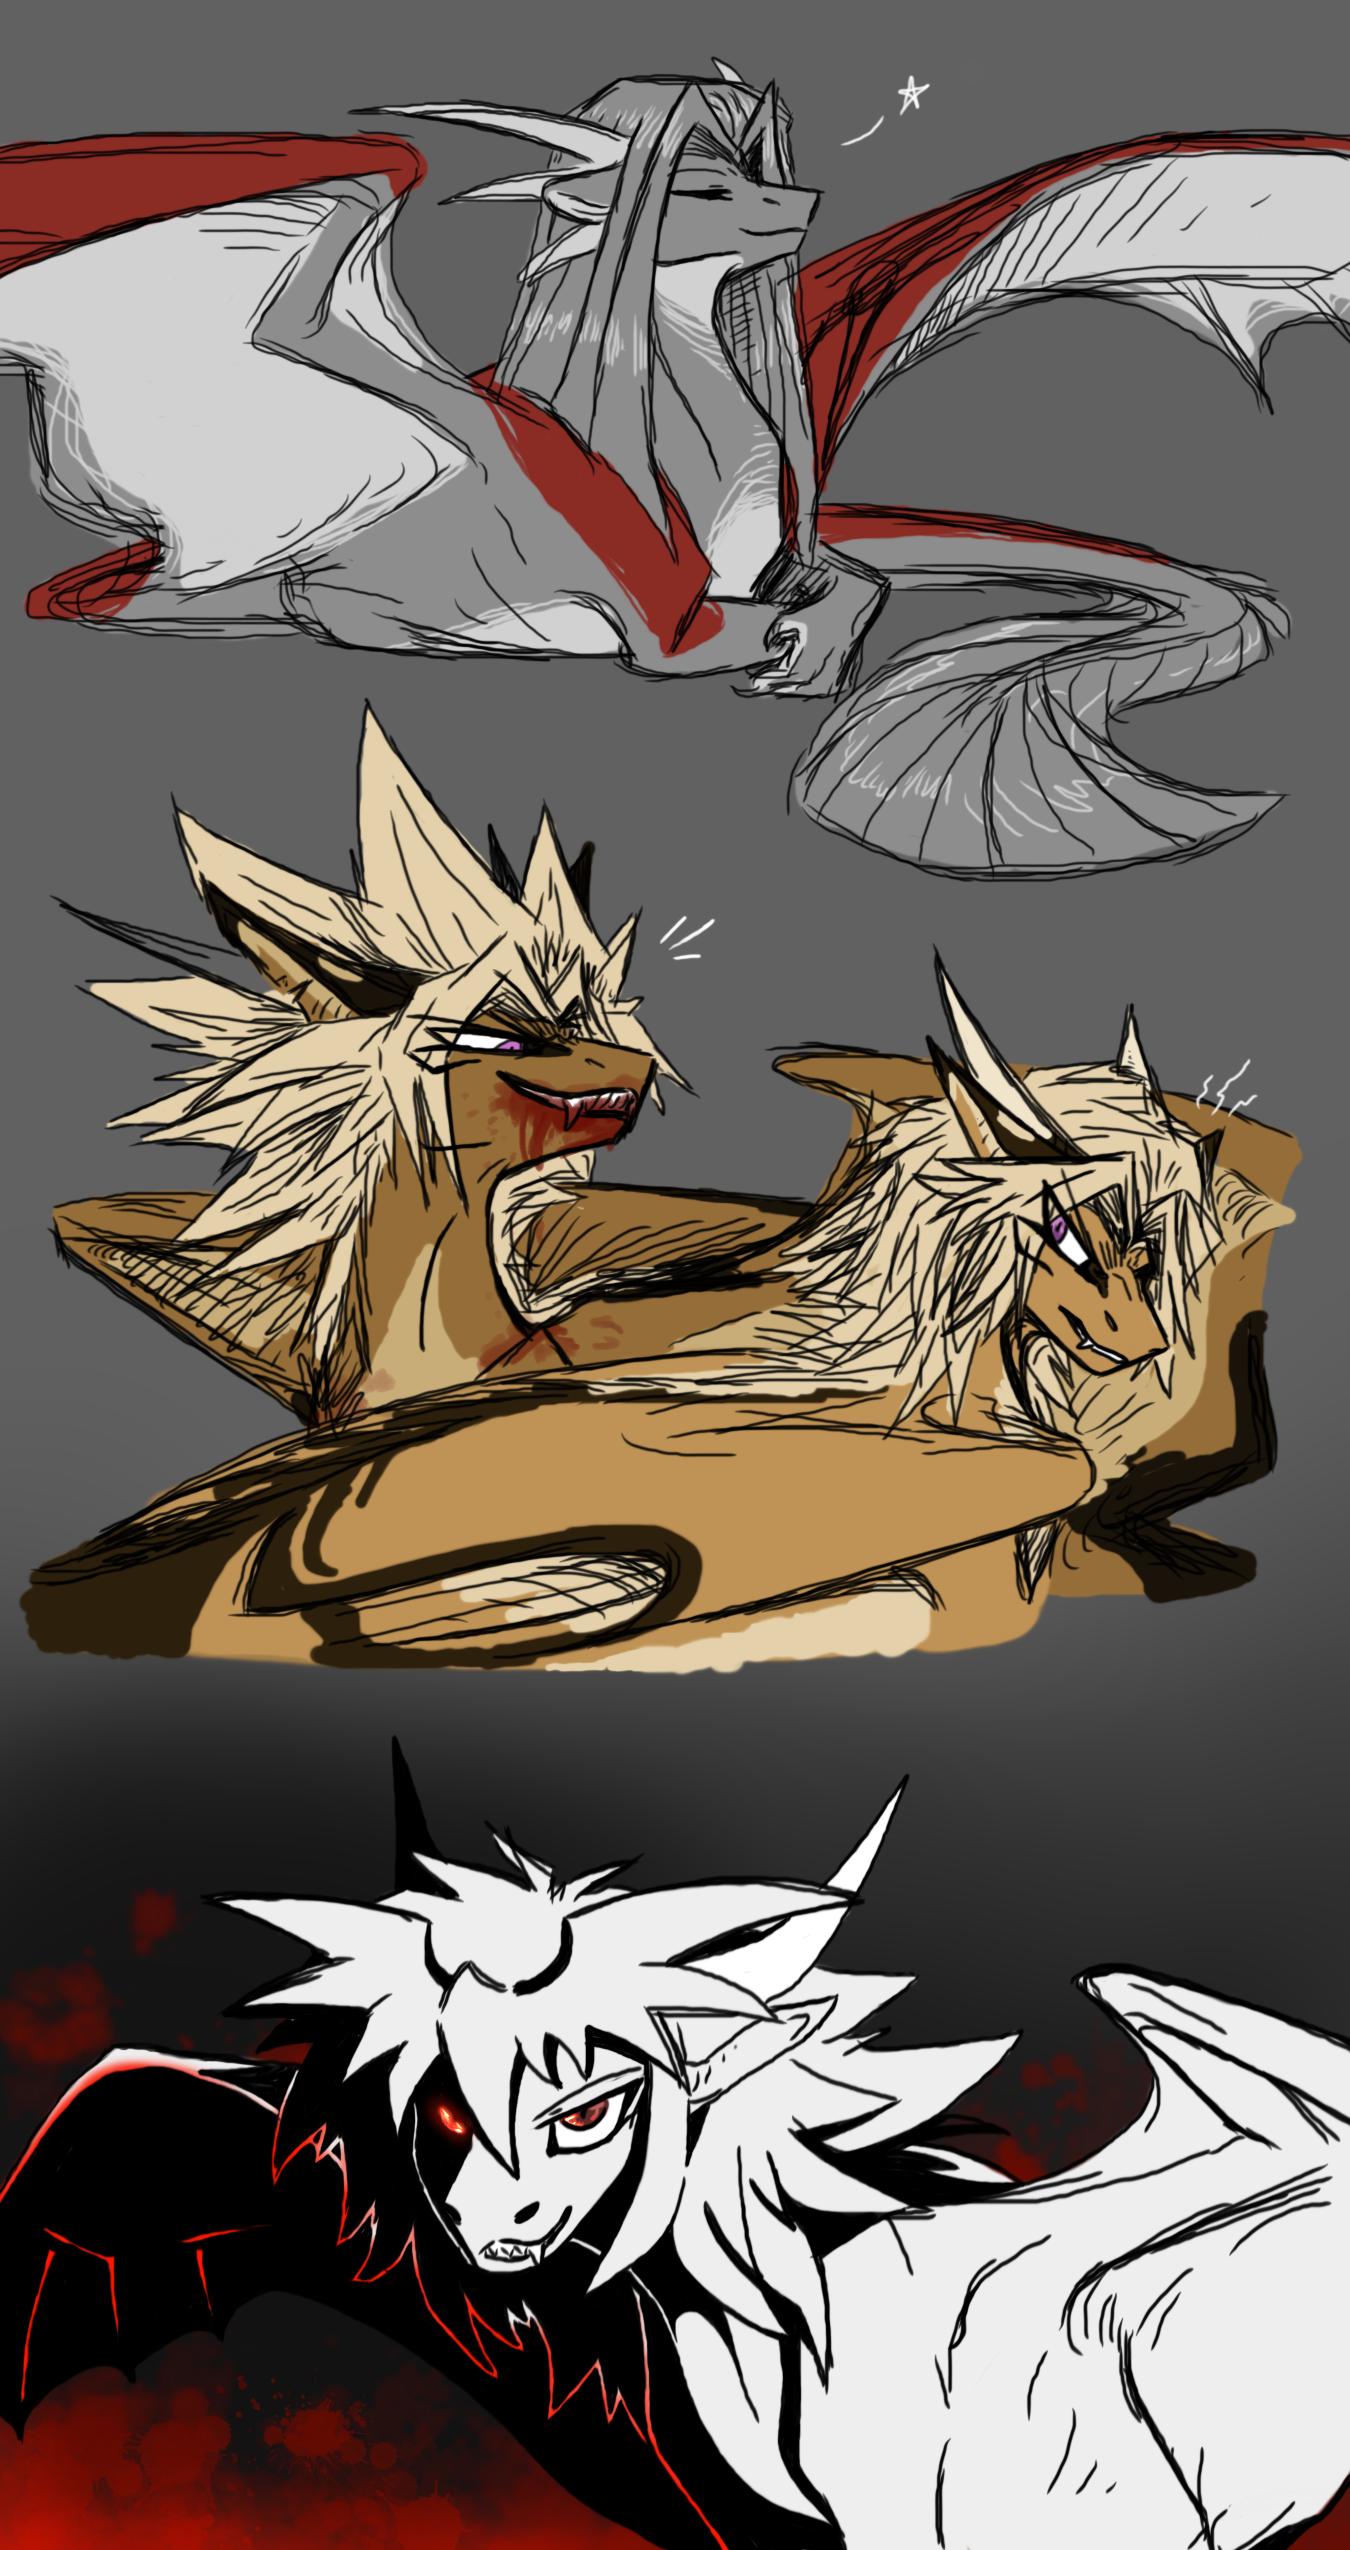 Yugioh Draconic AU Dump 4: Villains by CoffeeAddictedDragon